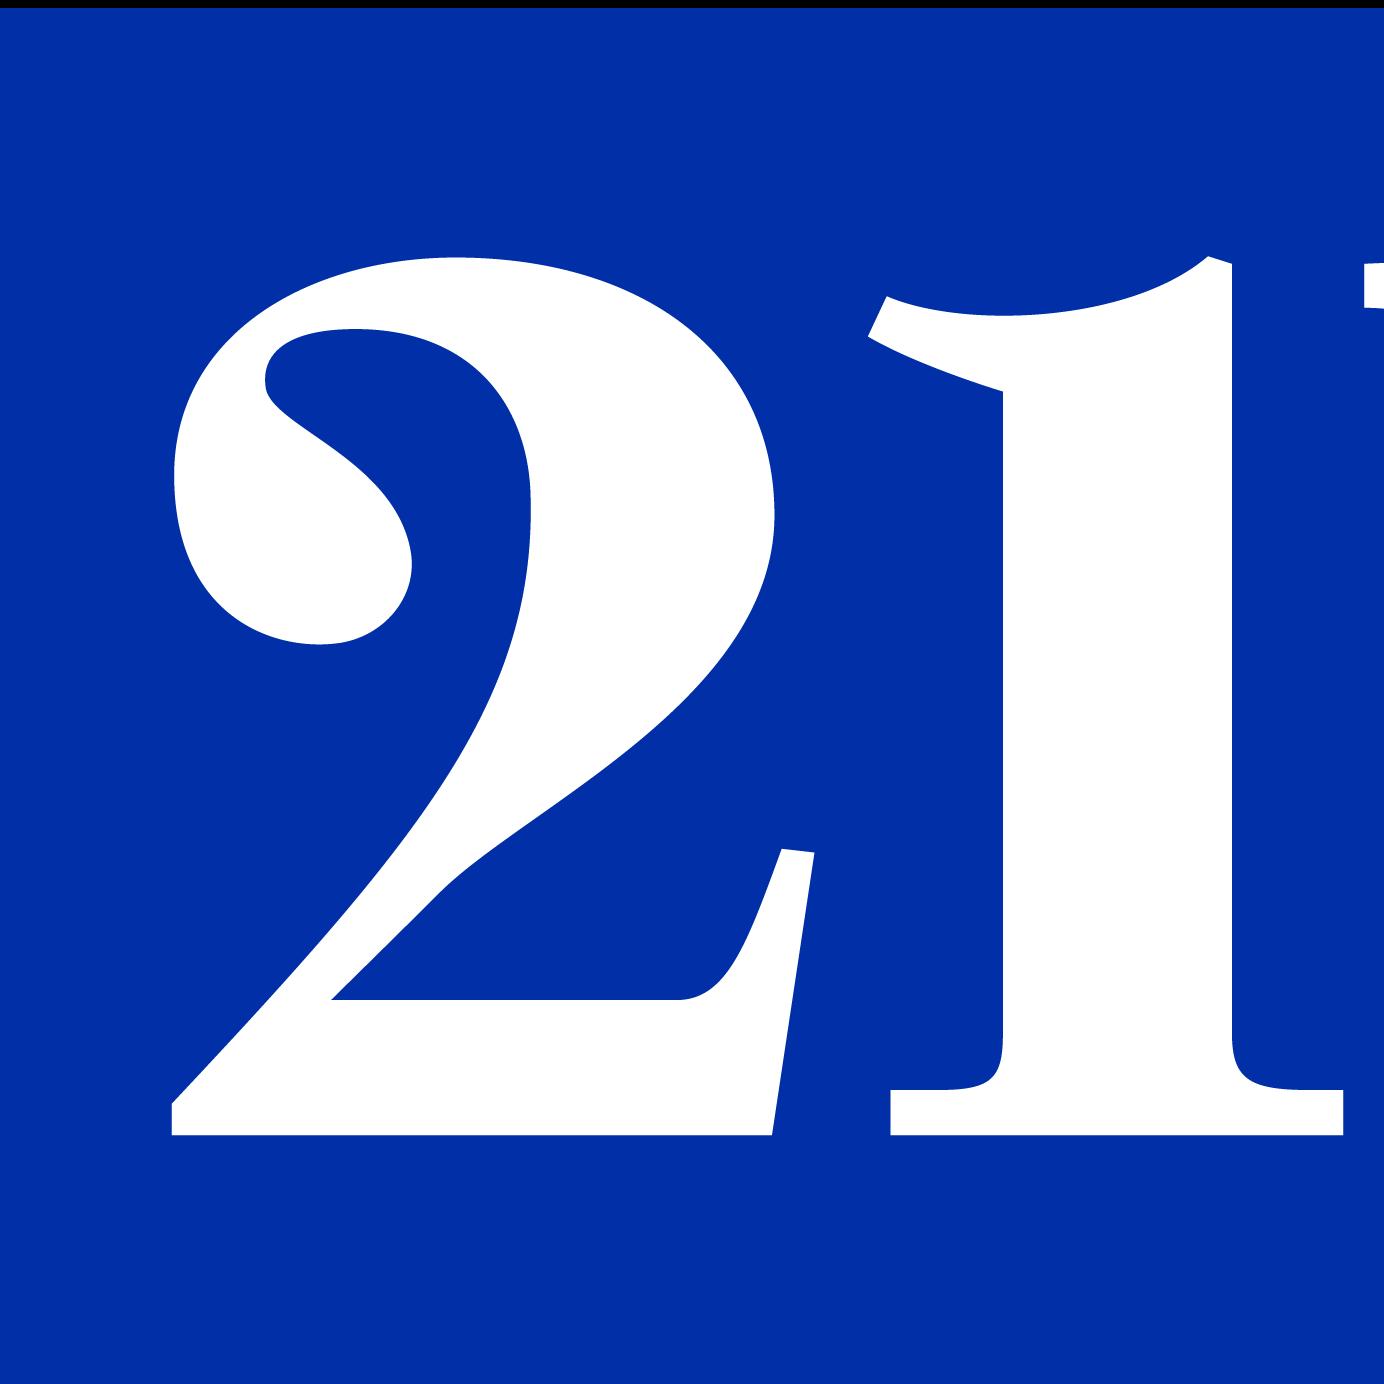 21bis upstreeam